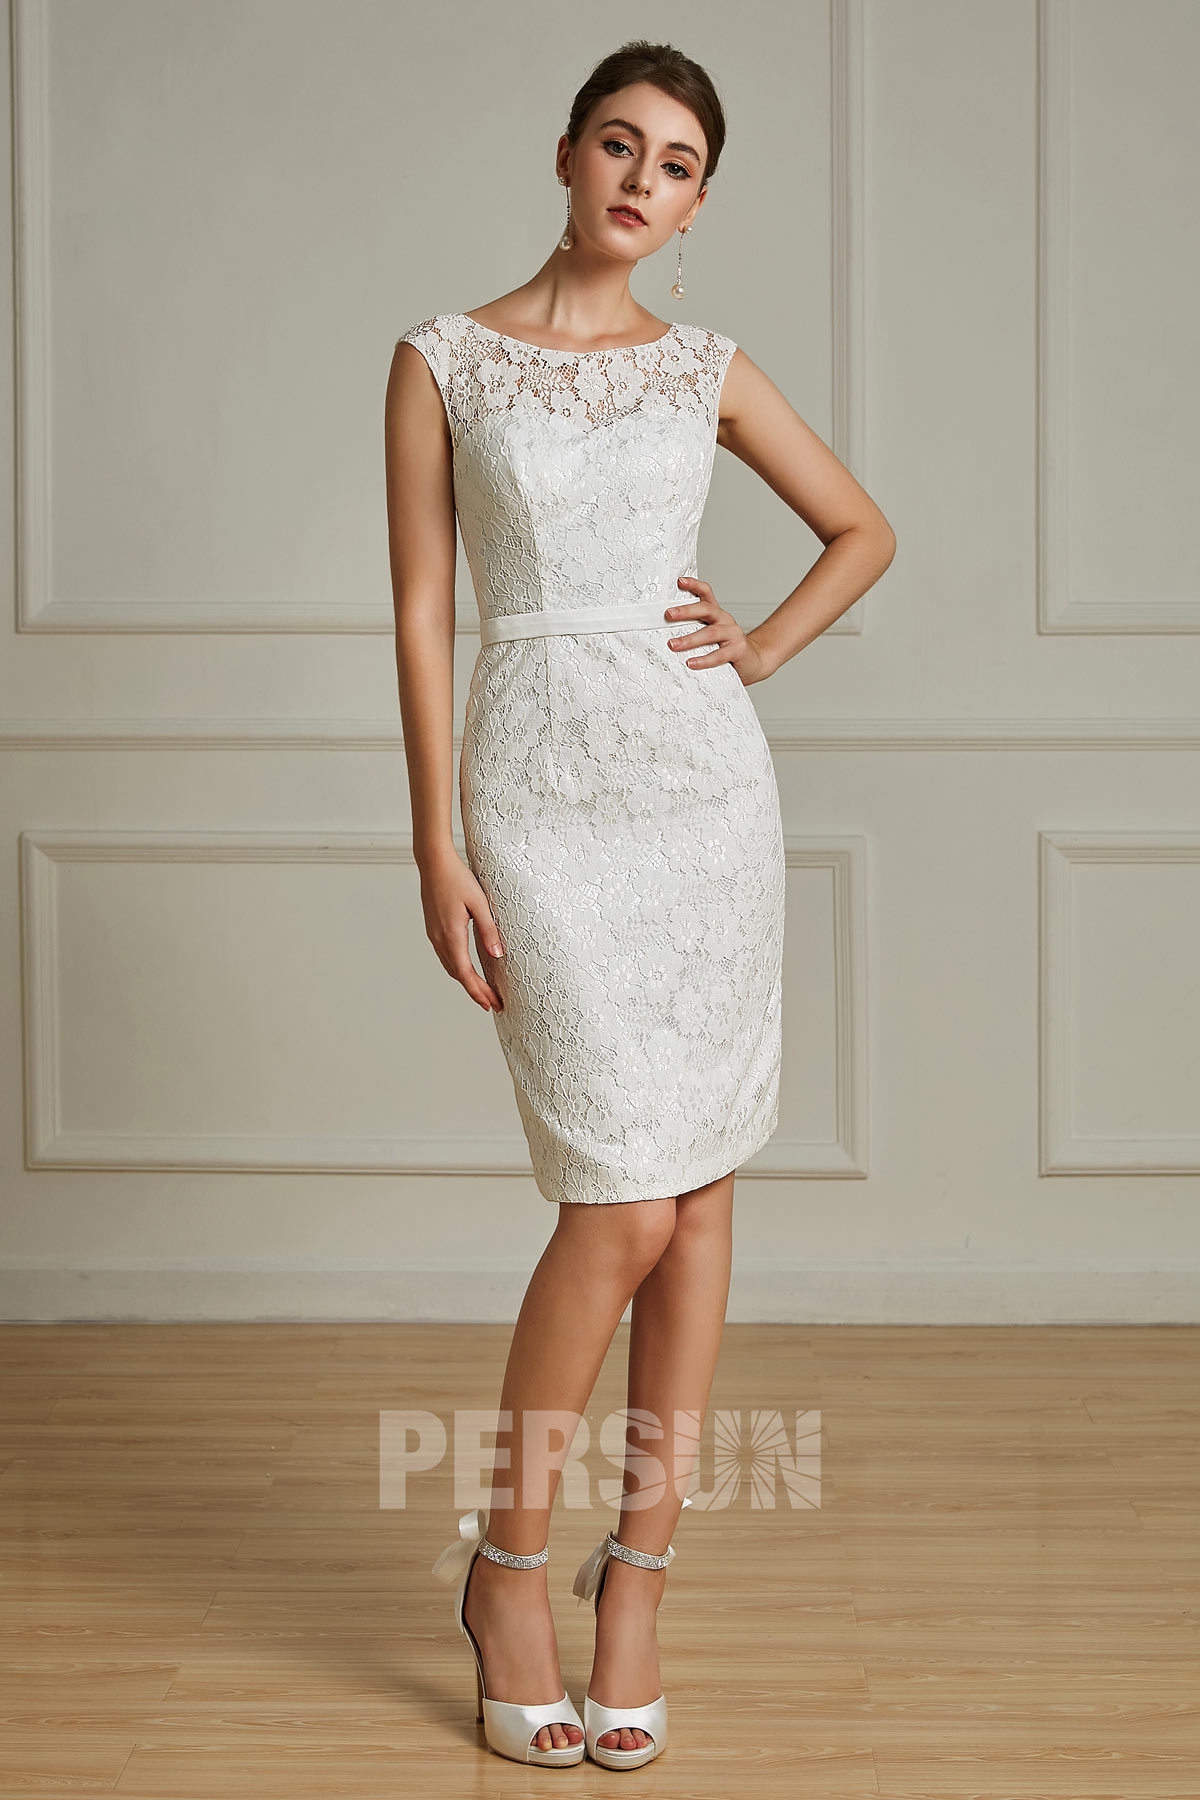 a4b099cb45 robe-cocktail-blanc-casse-dentelle | La mode du mariage